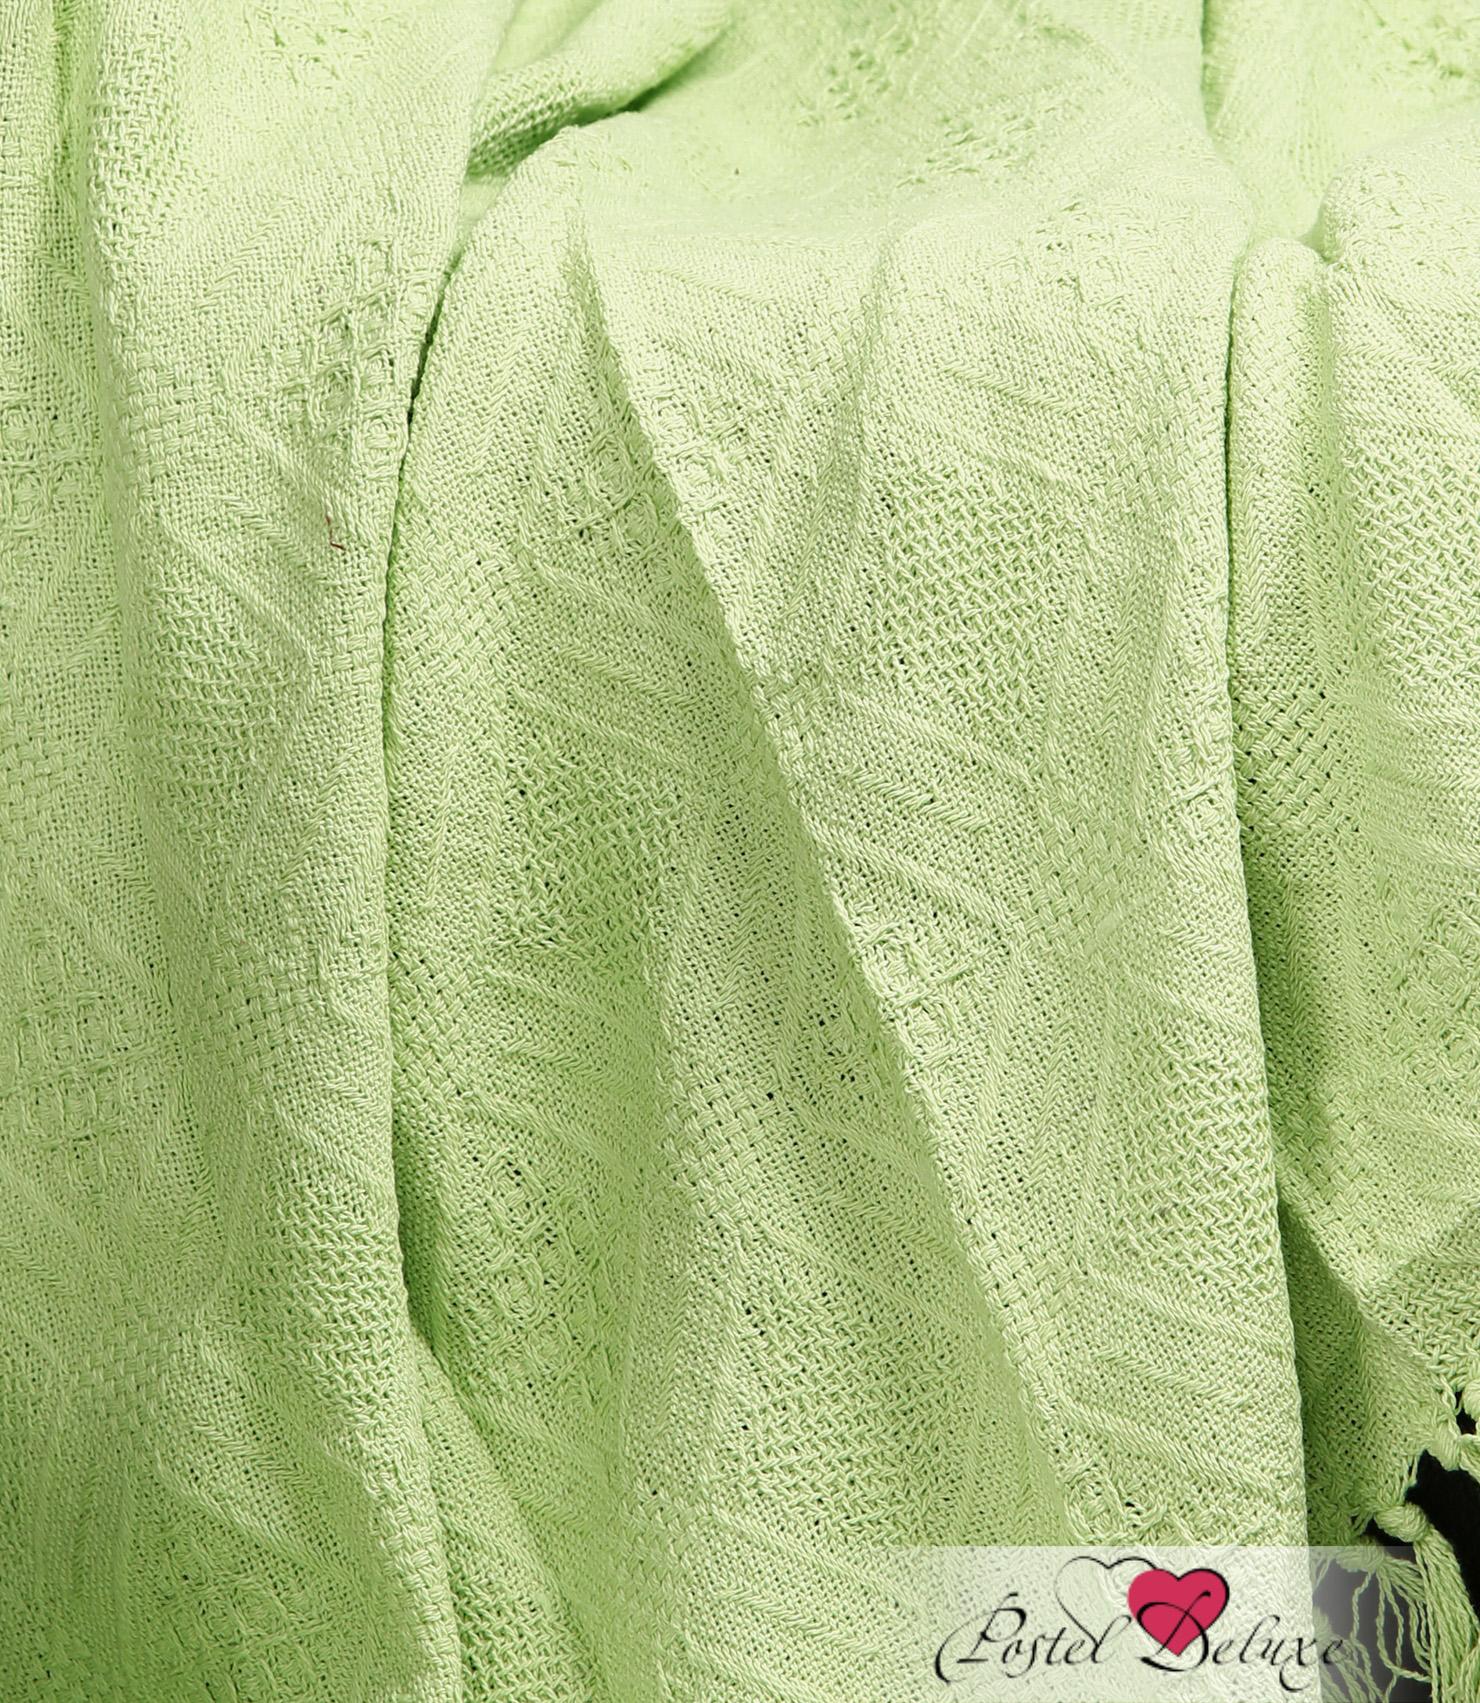 Покрывало Arloni Покрывало Зеленый чай (160х220 см) покрывало arloni финляндия скай 160х220 см 2048